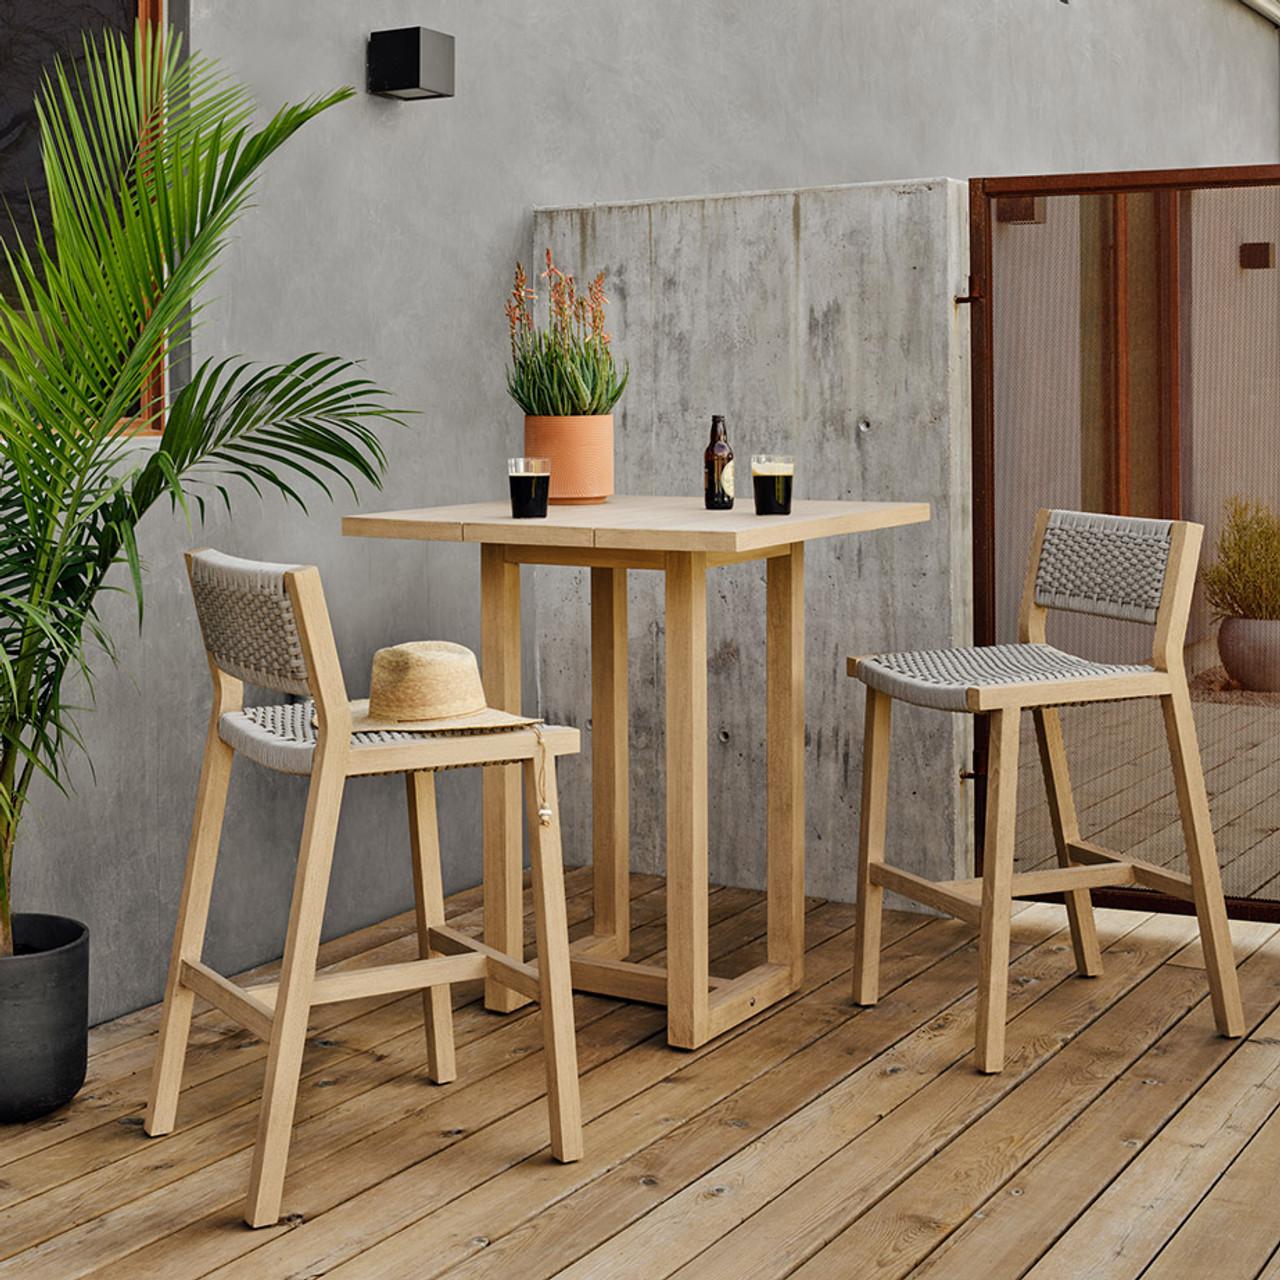 Tamarack Teak Outdoor Bar Table